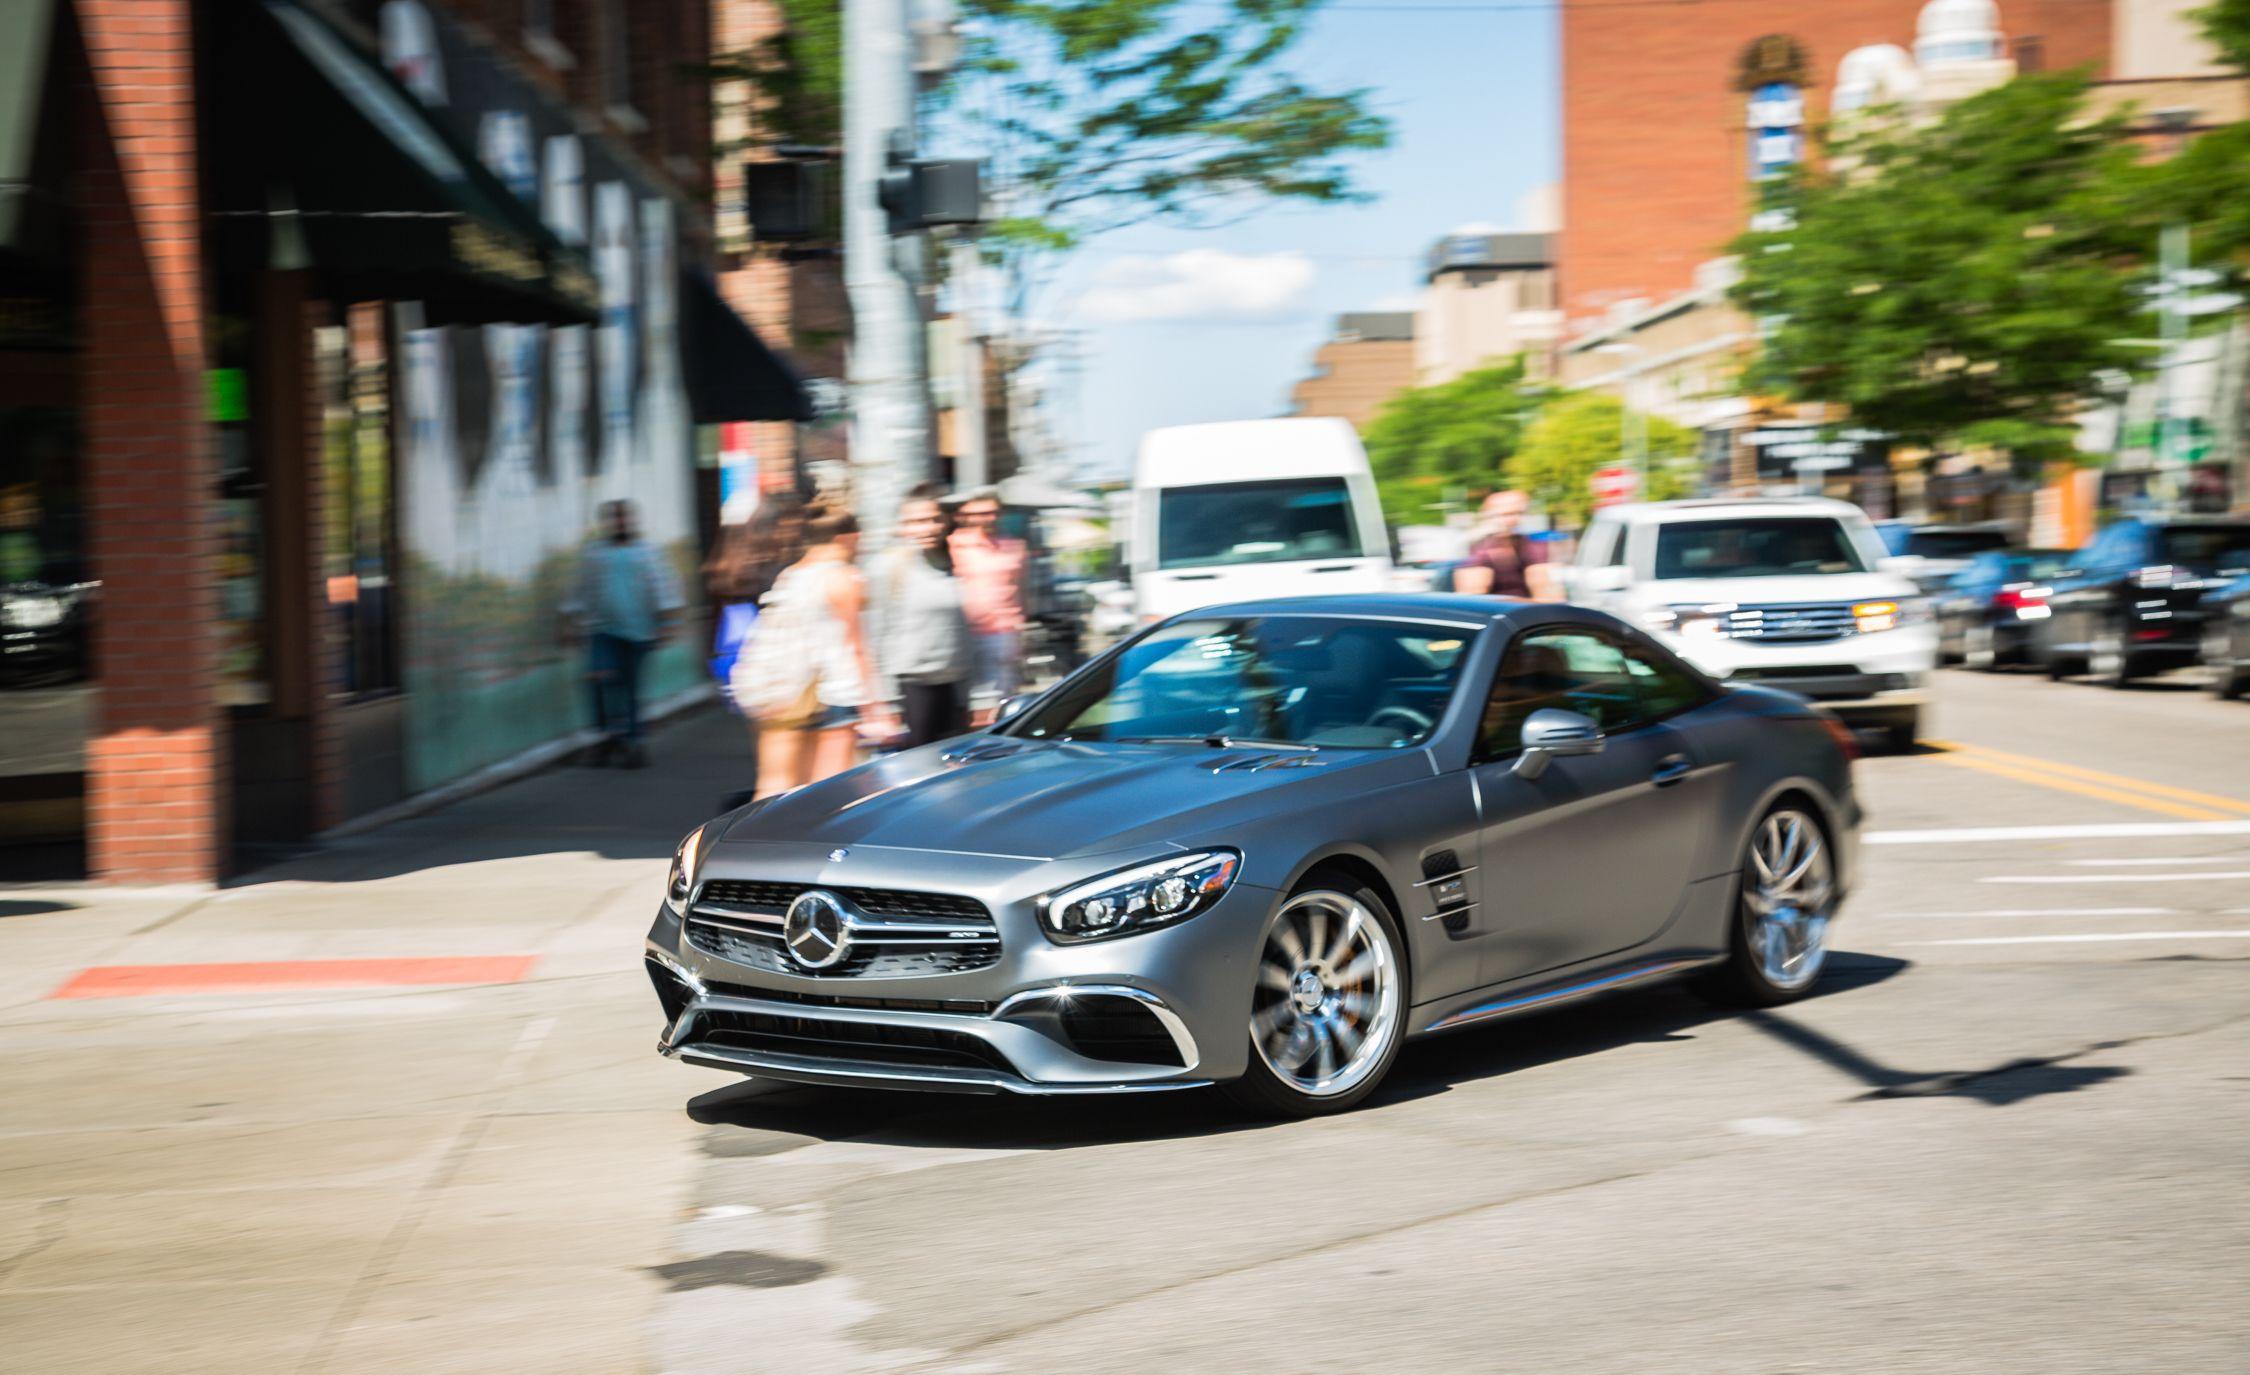 2019 Mercedes Amg Sl63 Sl65 Reviews Price Photos And Specs Car Driver